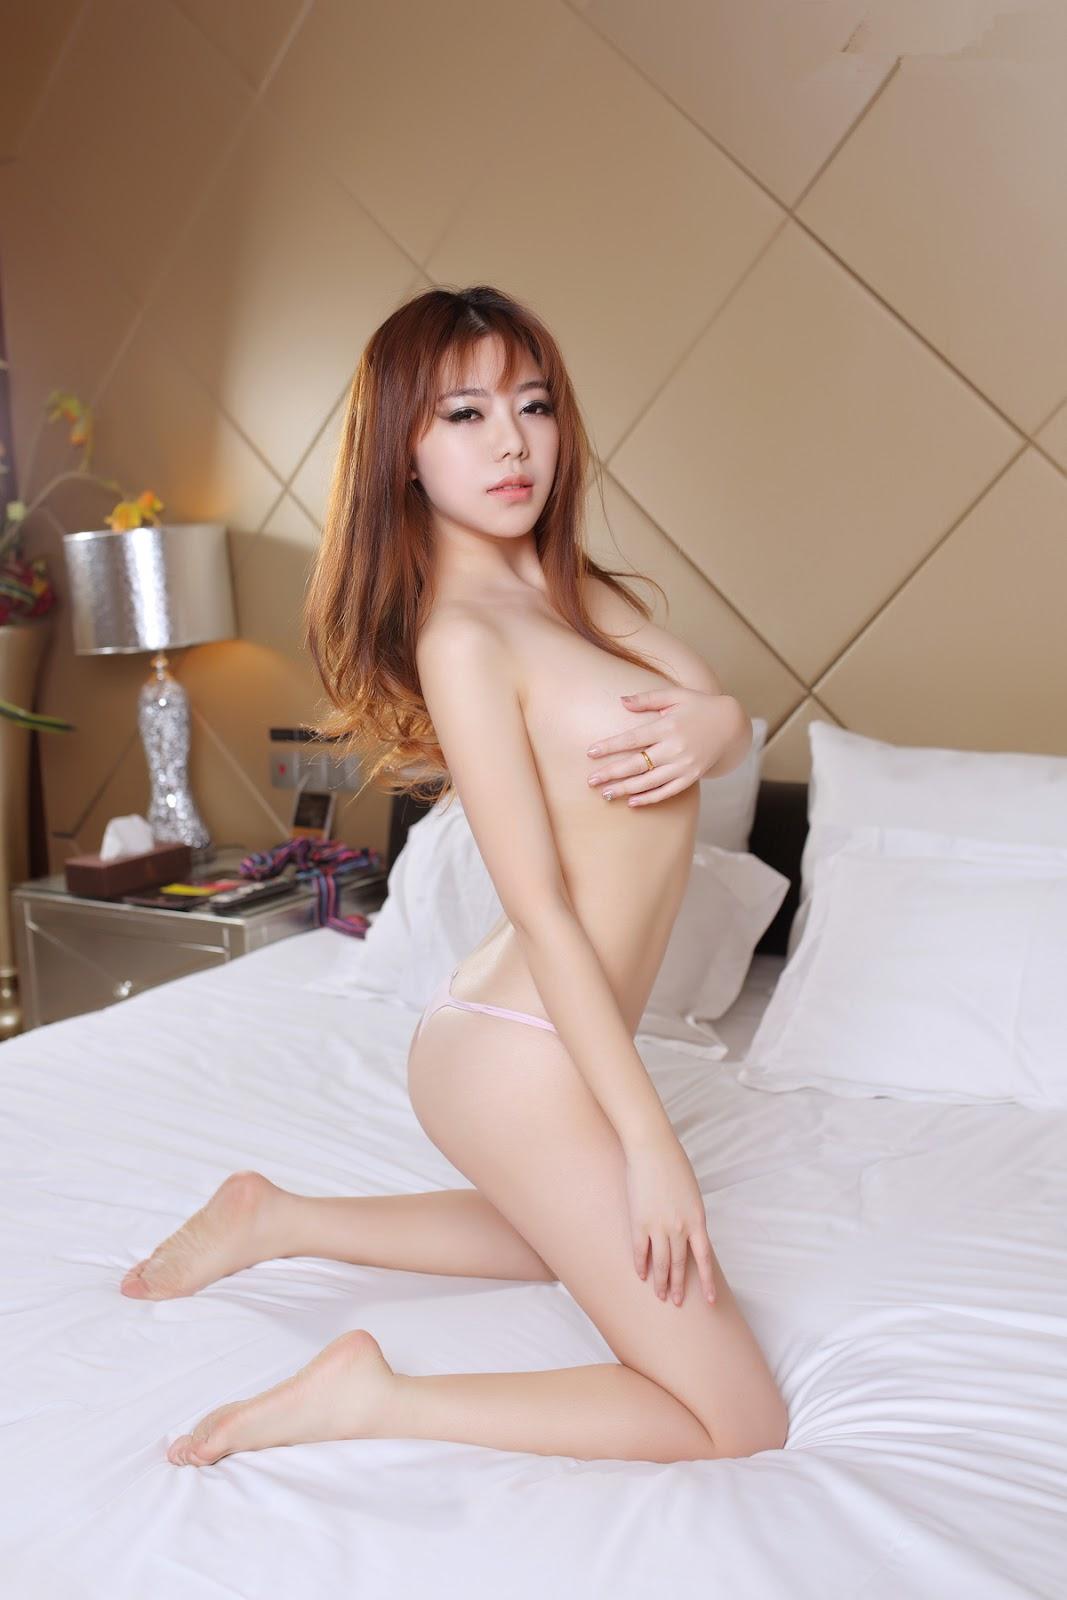 %2529%252B%252B%25C2%25A6%25C2%25B7 58 - TGOD Sexy Nude FAYE